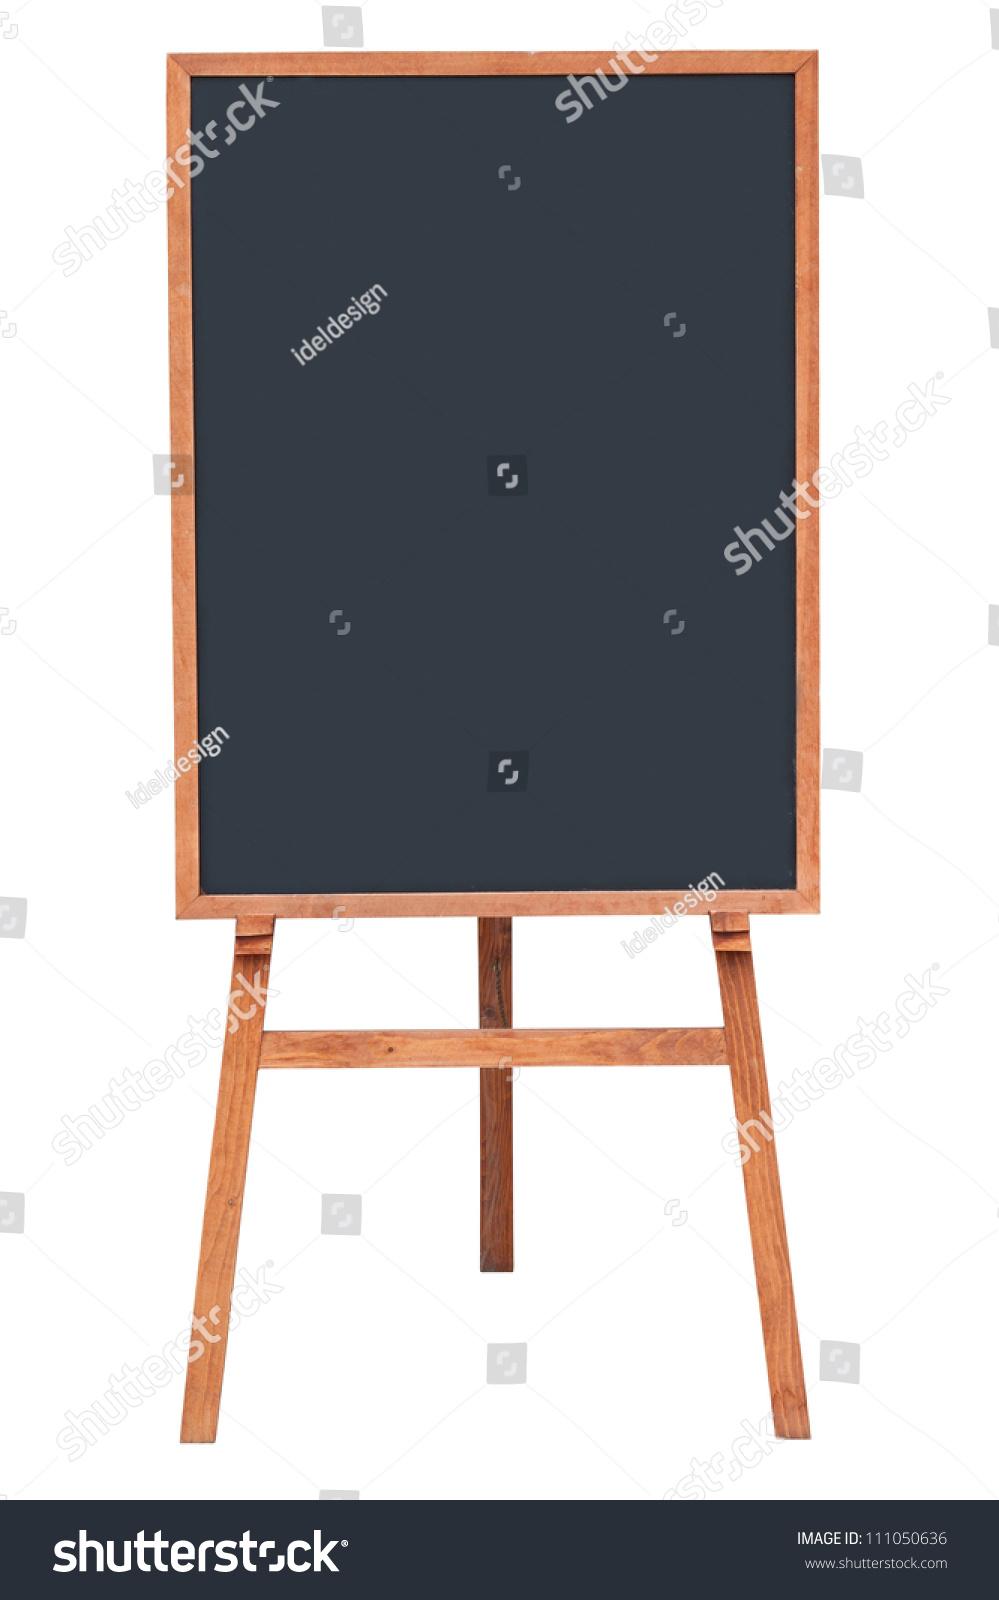 Blank Menu Chalkboard Wooden Frame Isolated Stock Photo